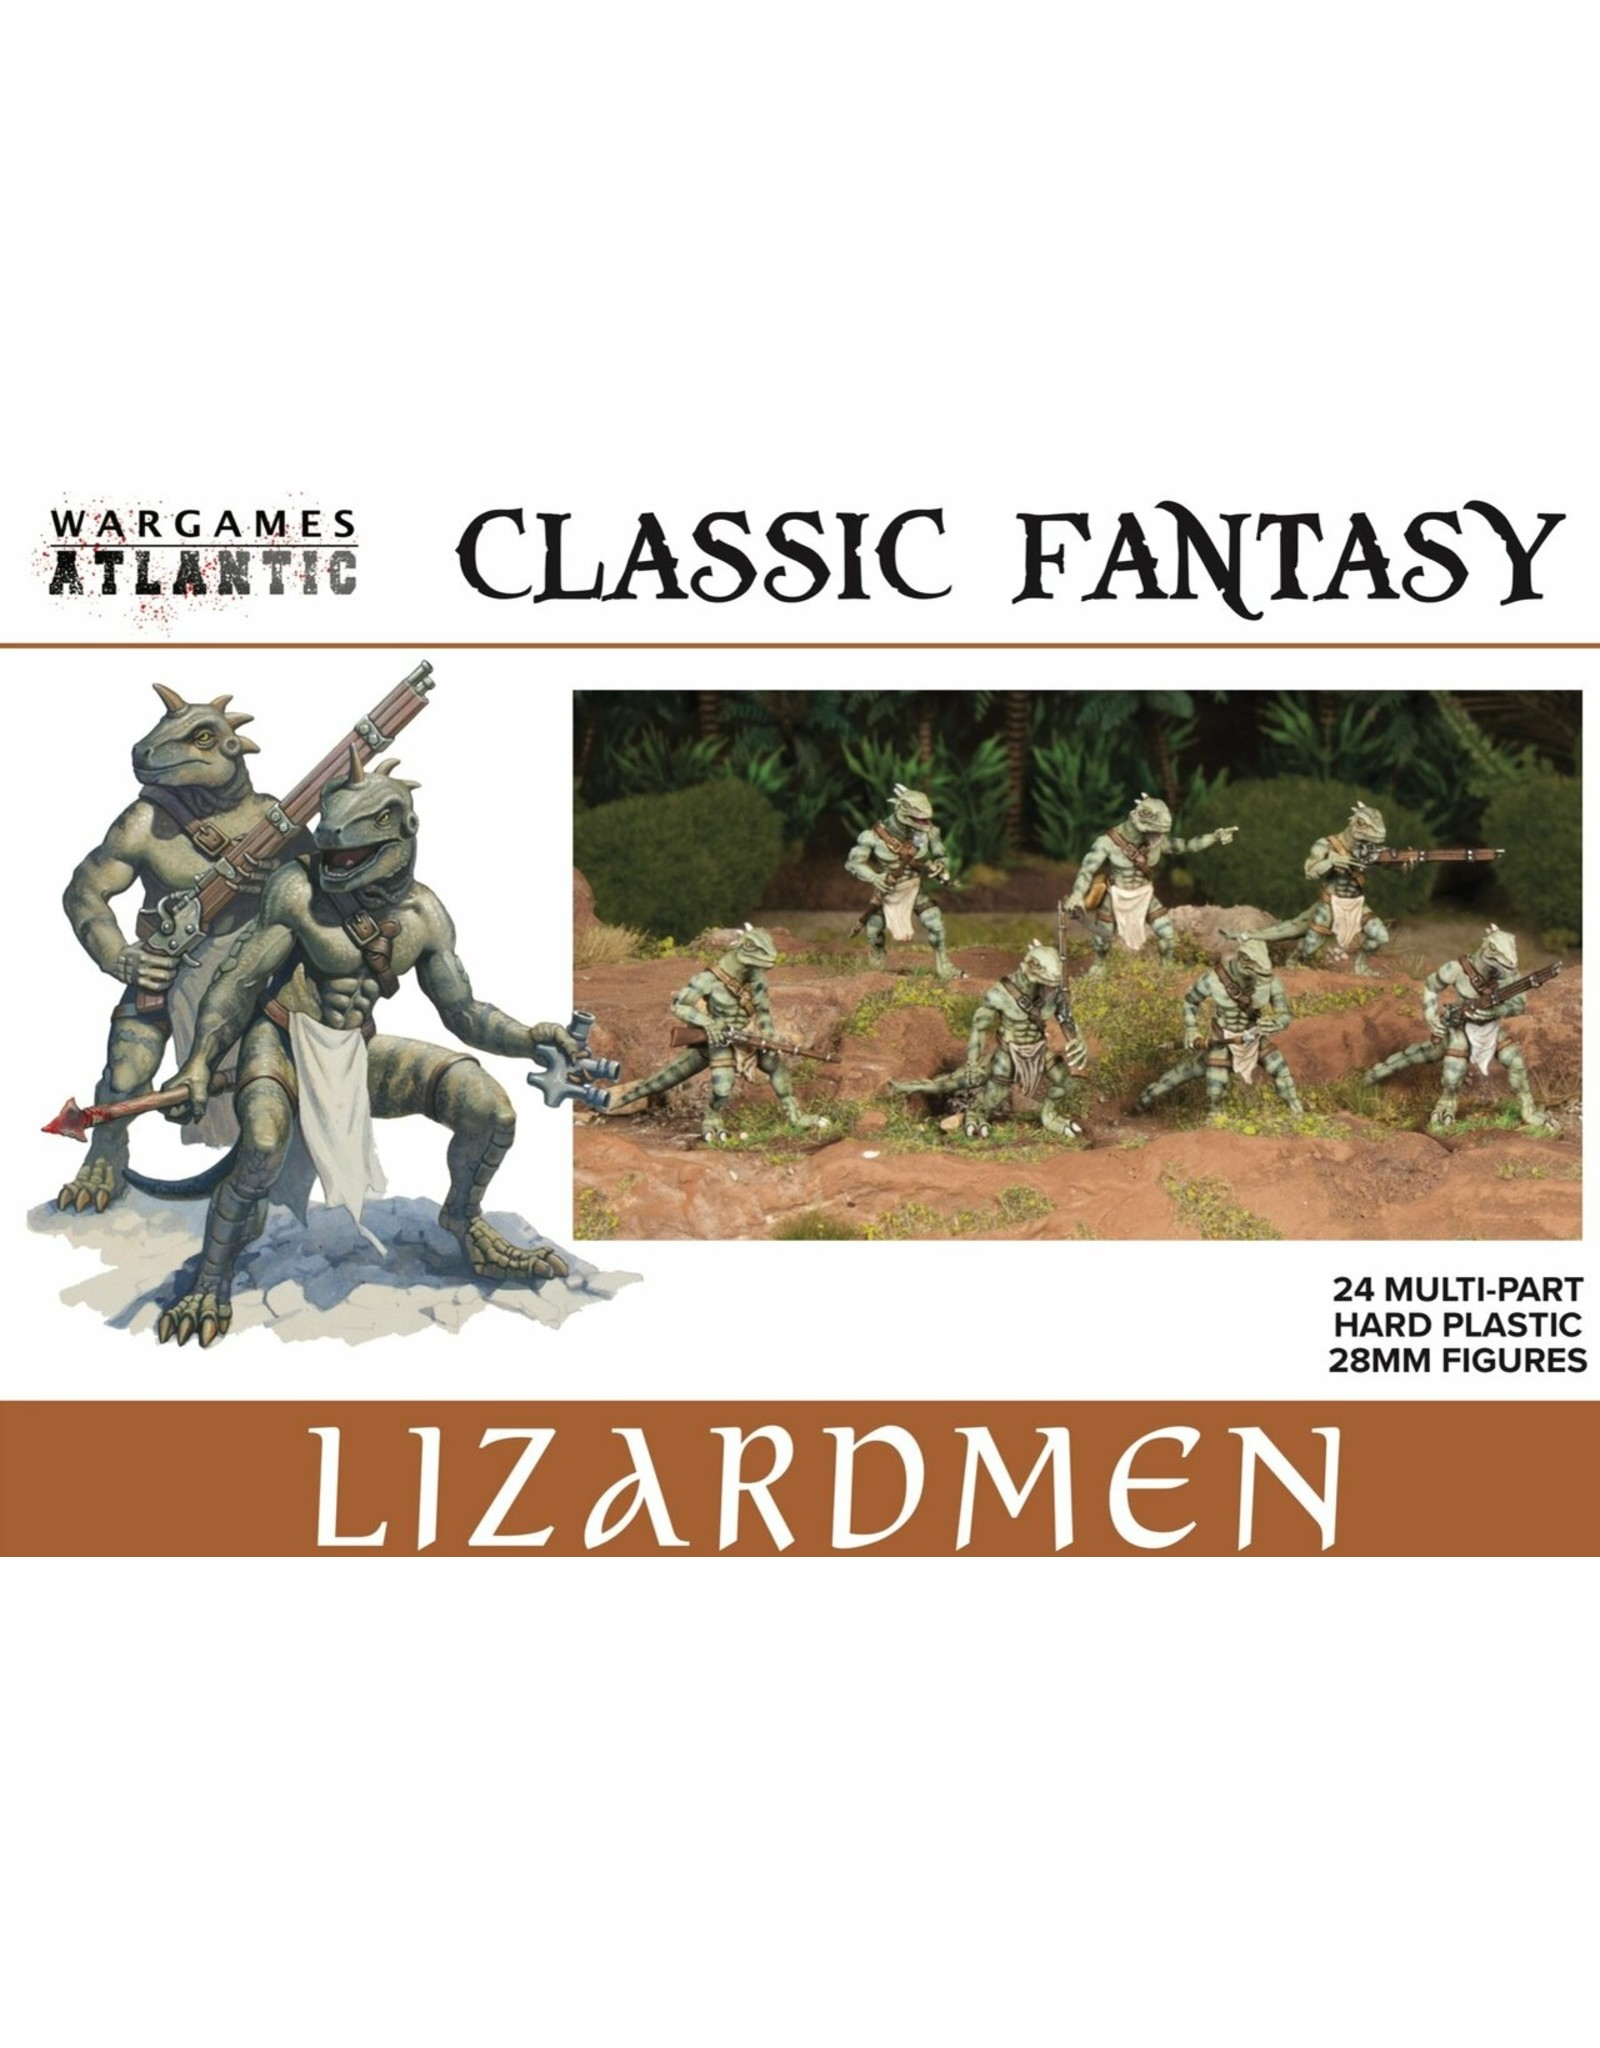 Wargames Atlantic Classic Fantasy: Lizardmen